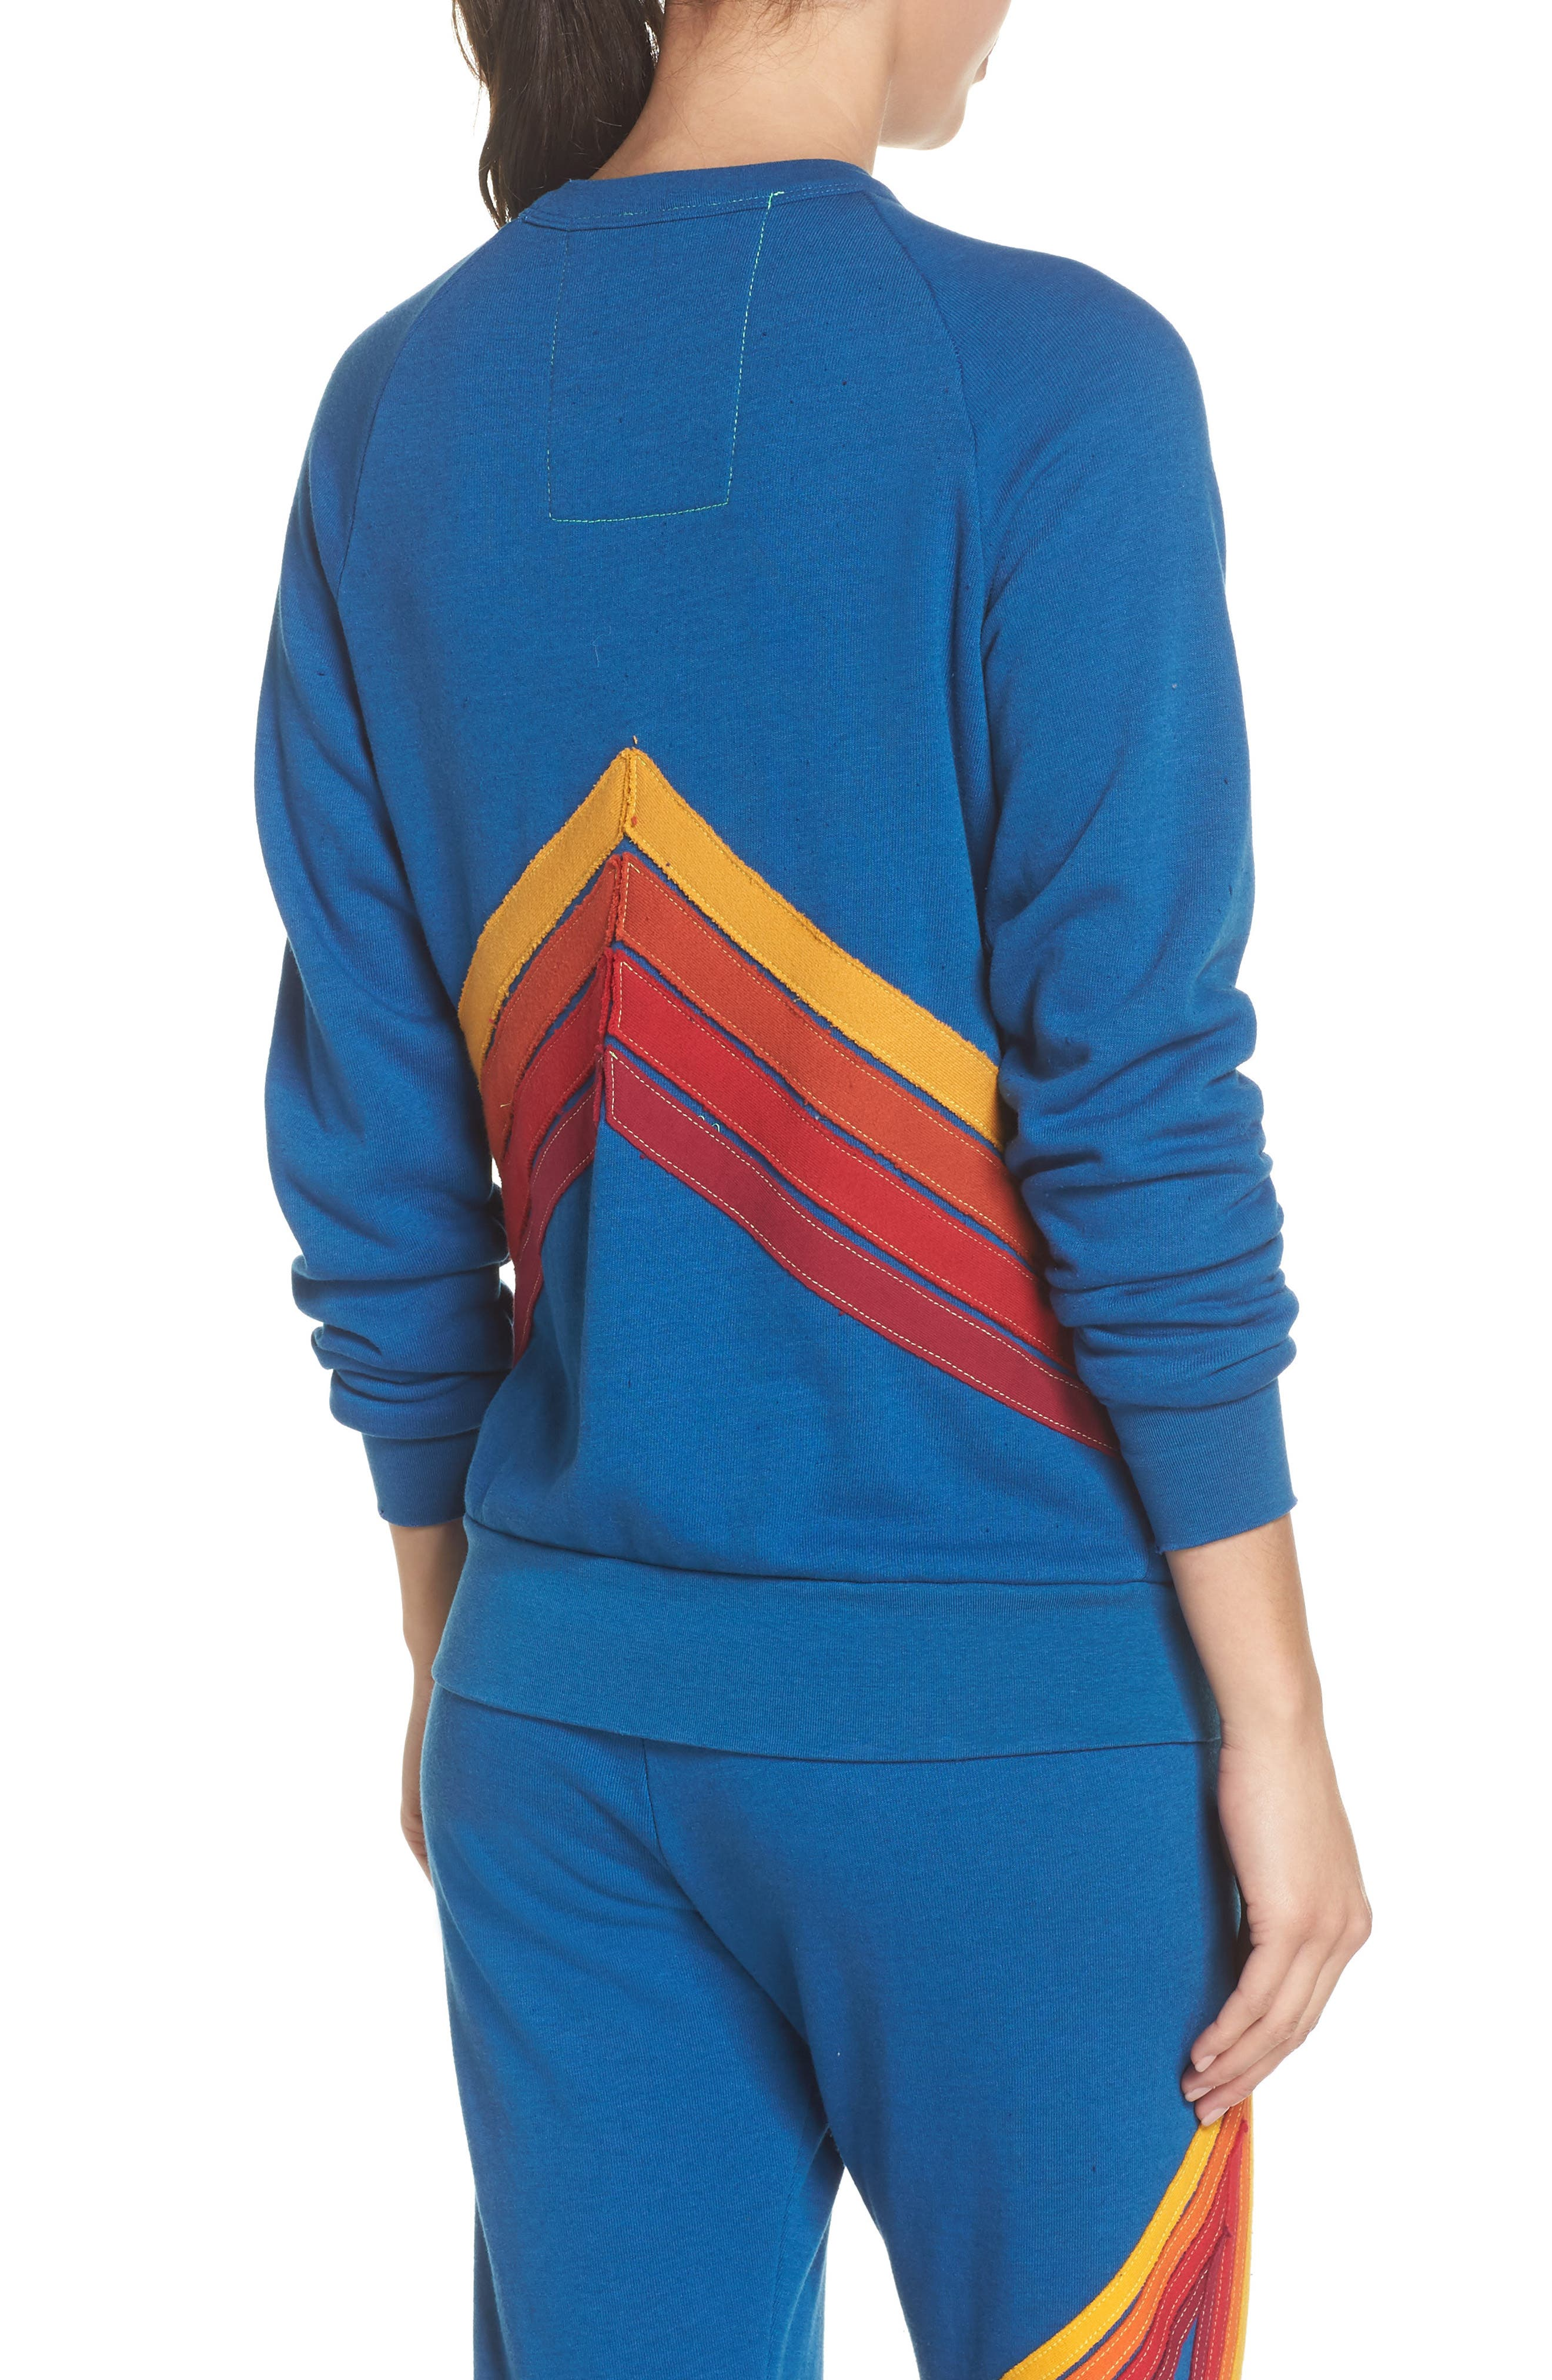 Mountain Stripe Crewneck Sweatshirt,                             Alternate thumbnail 2, color,                             Caribbean/ Red Stripes